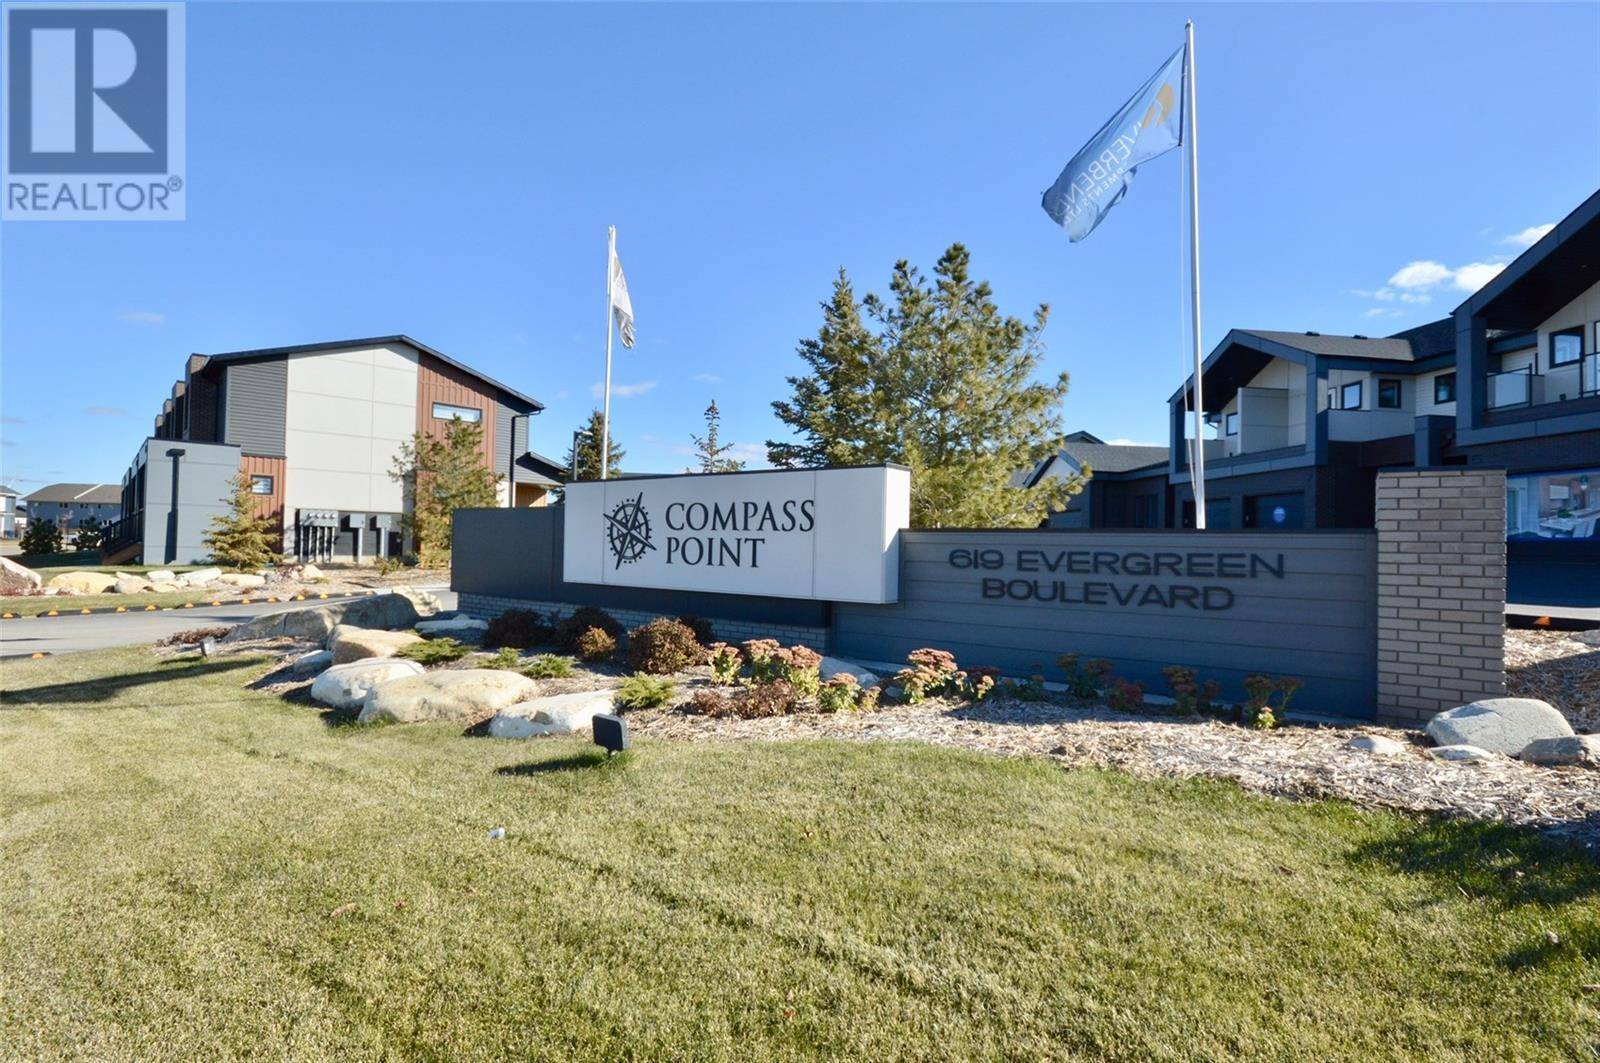 Townhouse for sale at 625 Evergreen Blvd Saskatoon Saskatchewan - MLS: SK790762